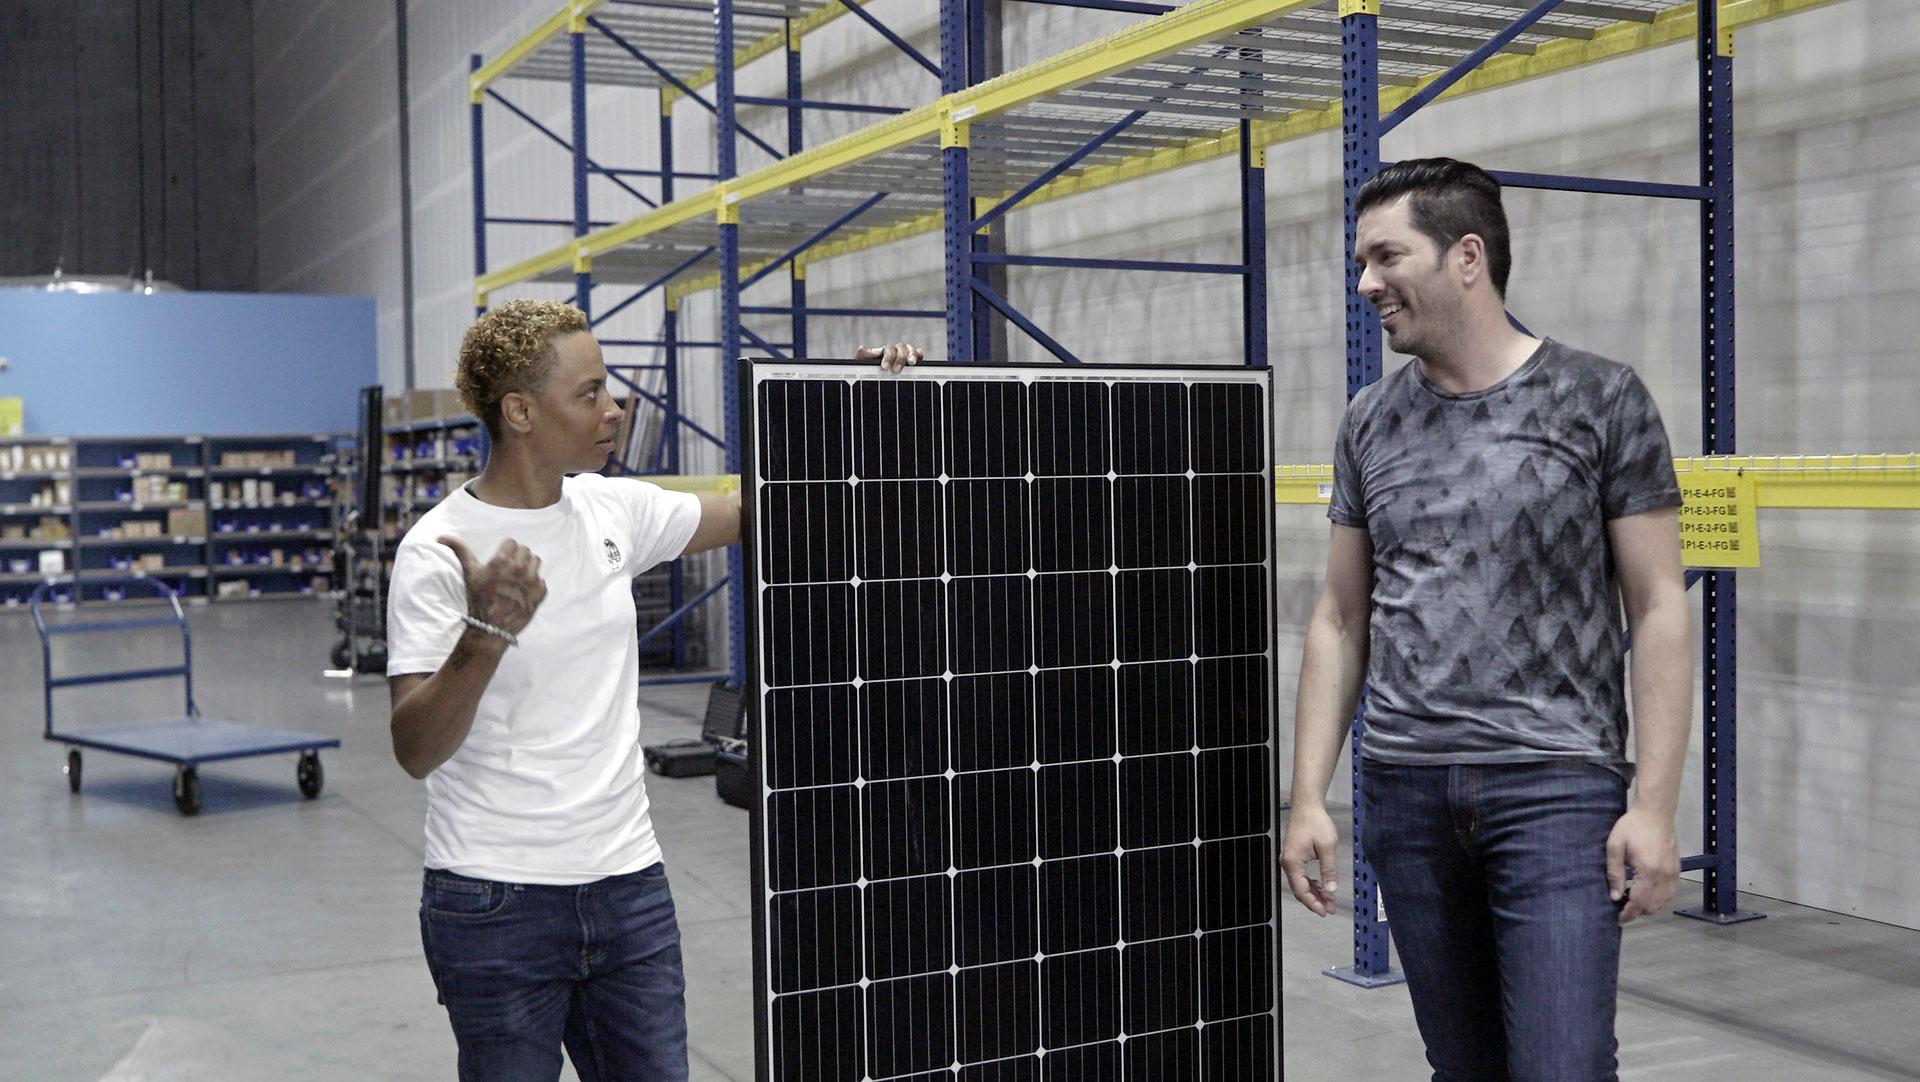 Jonathan Scott at a solar company in Nevada, with solar panel